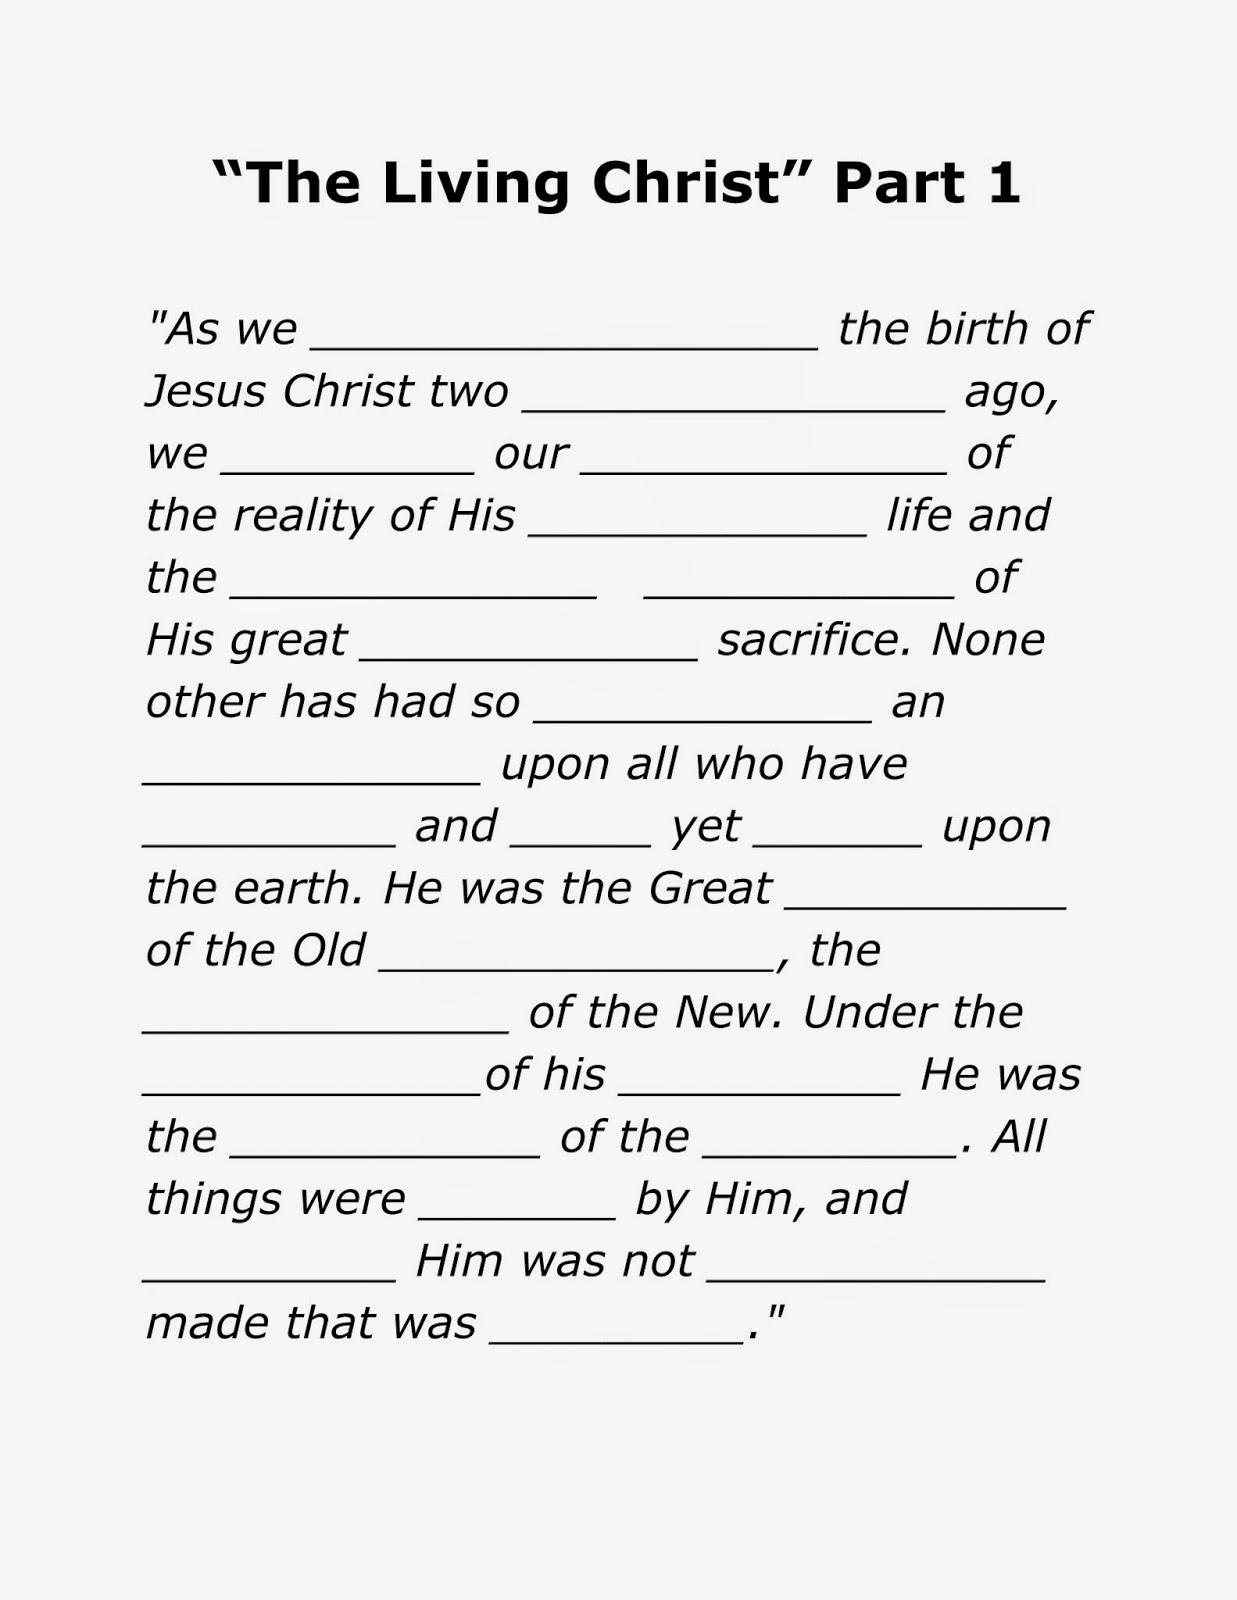 The Living Christ Songs